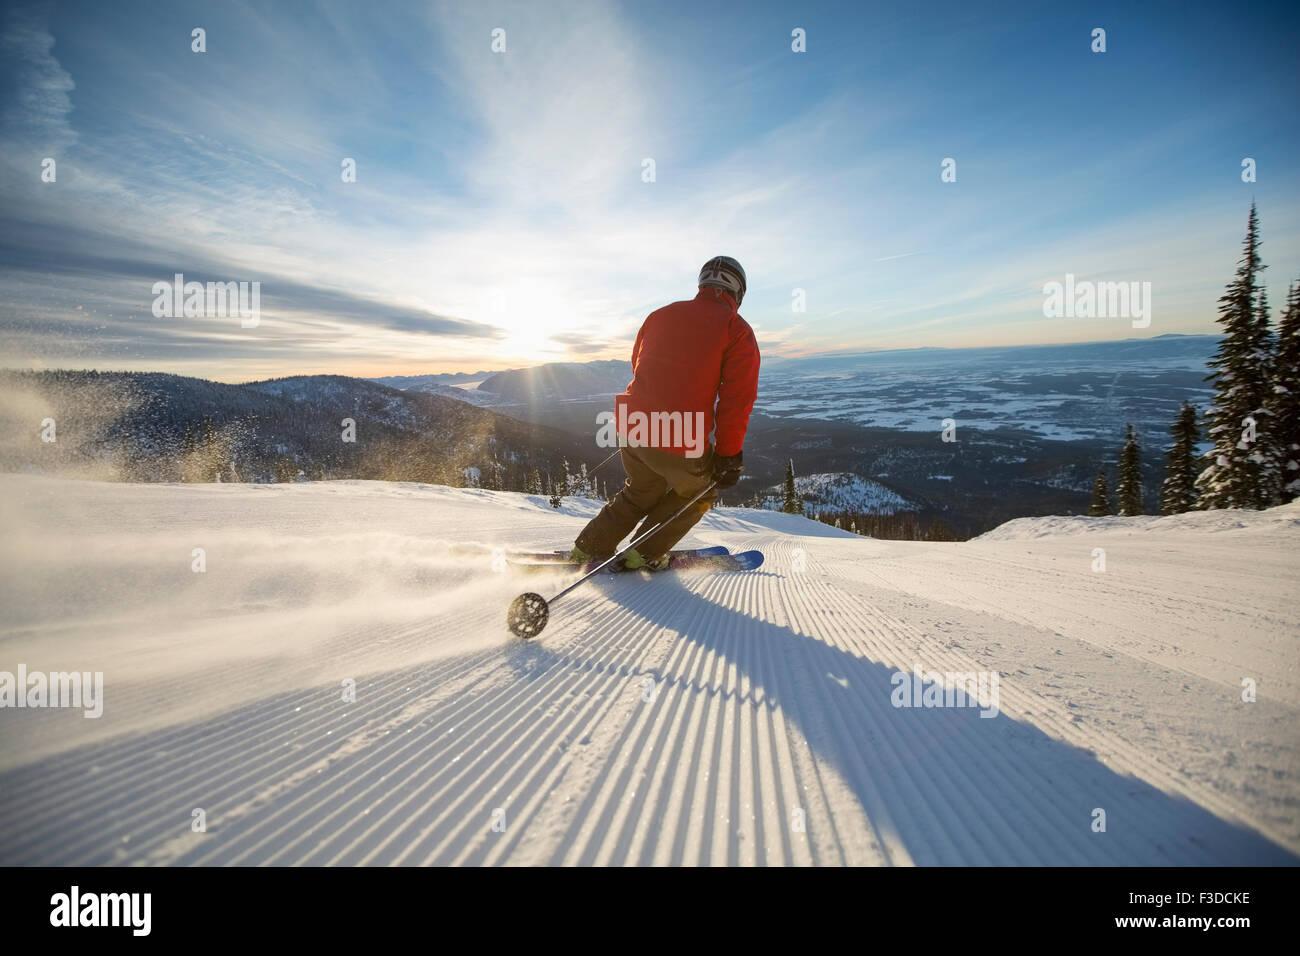 Hombre maduro en esquí en Sunset Imagen De Stock